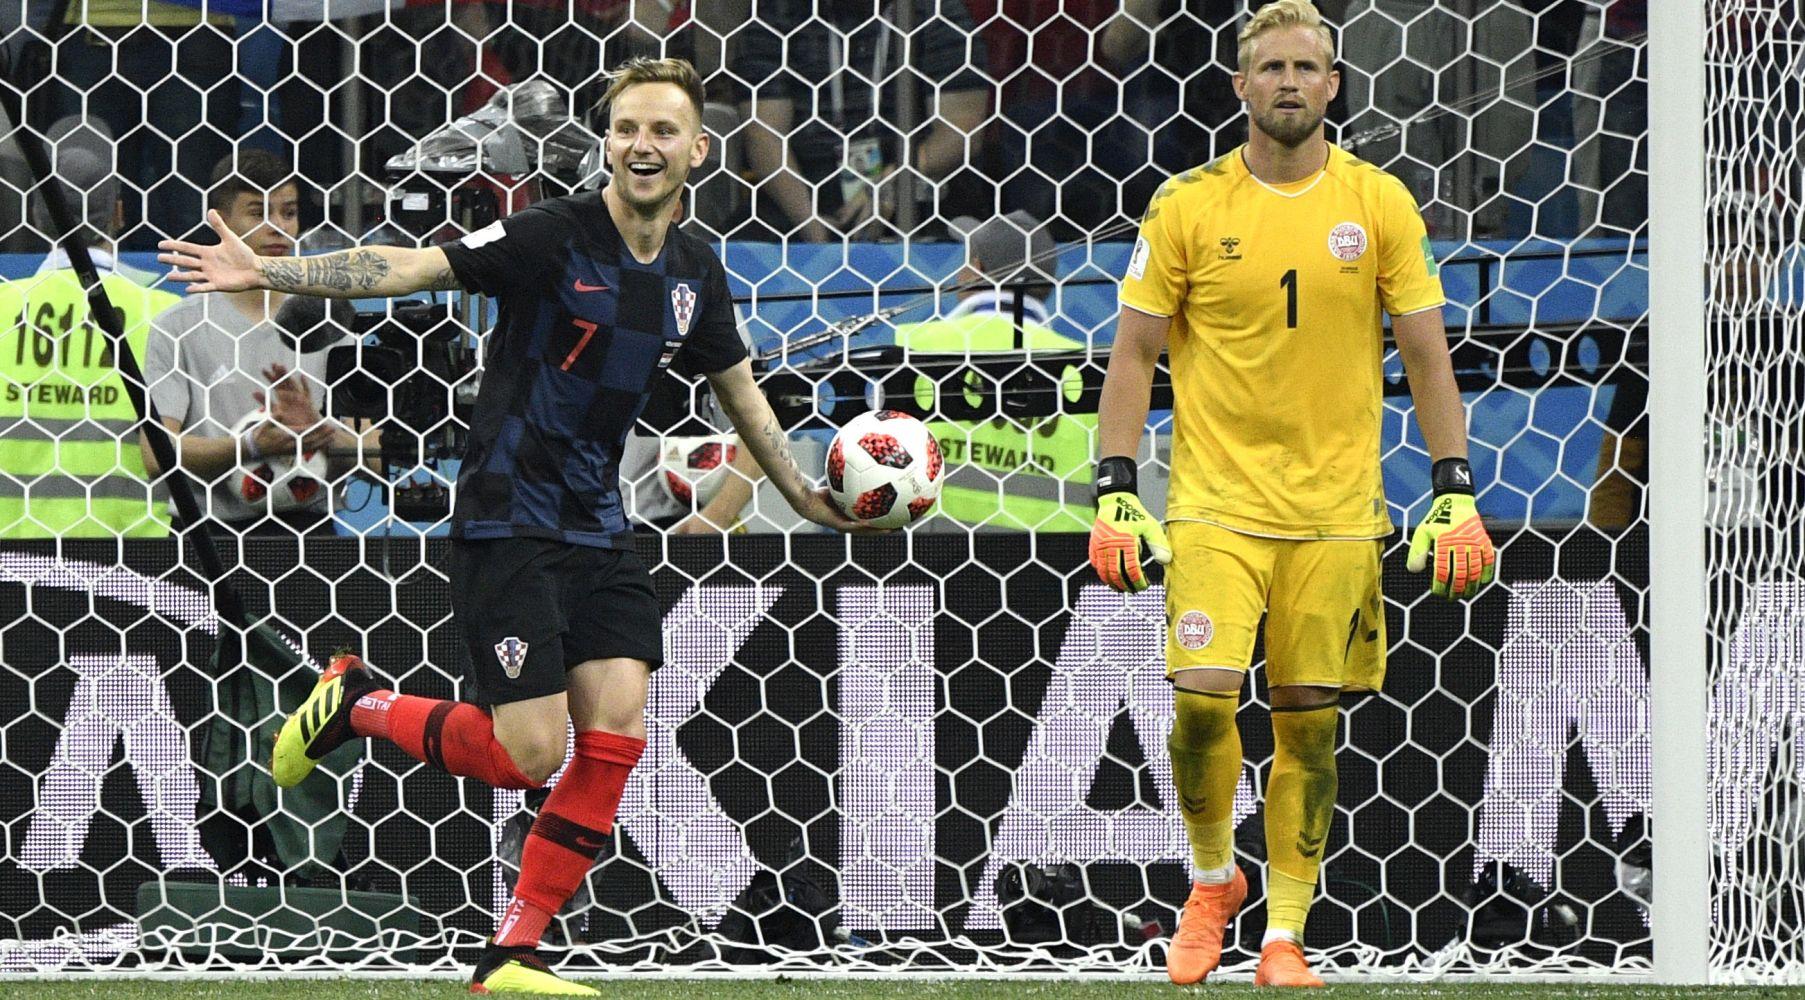 2018 World Cup final